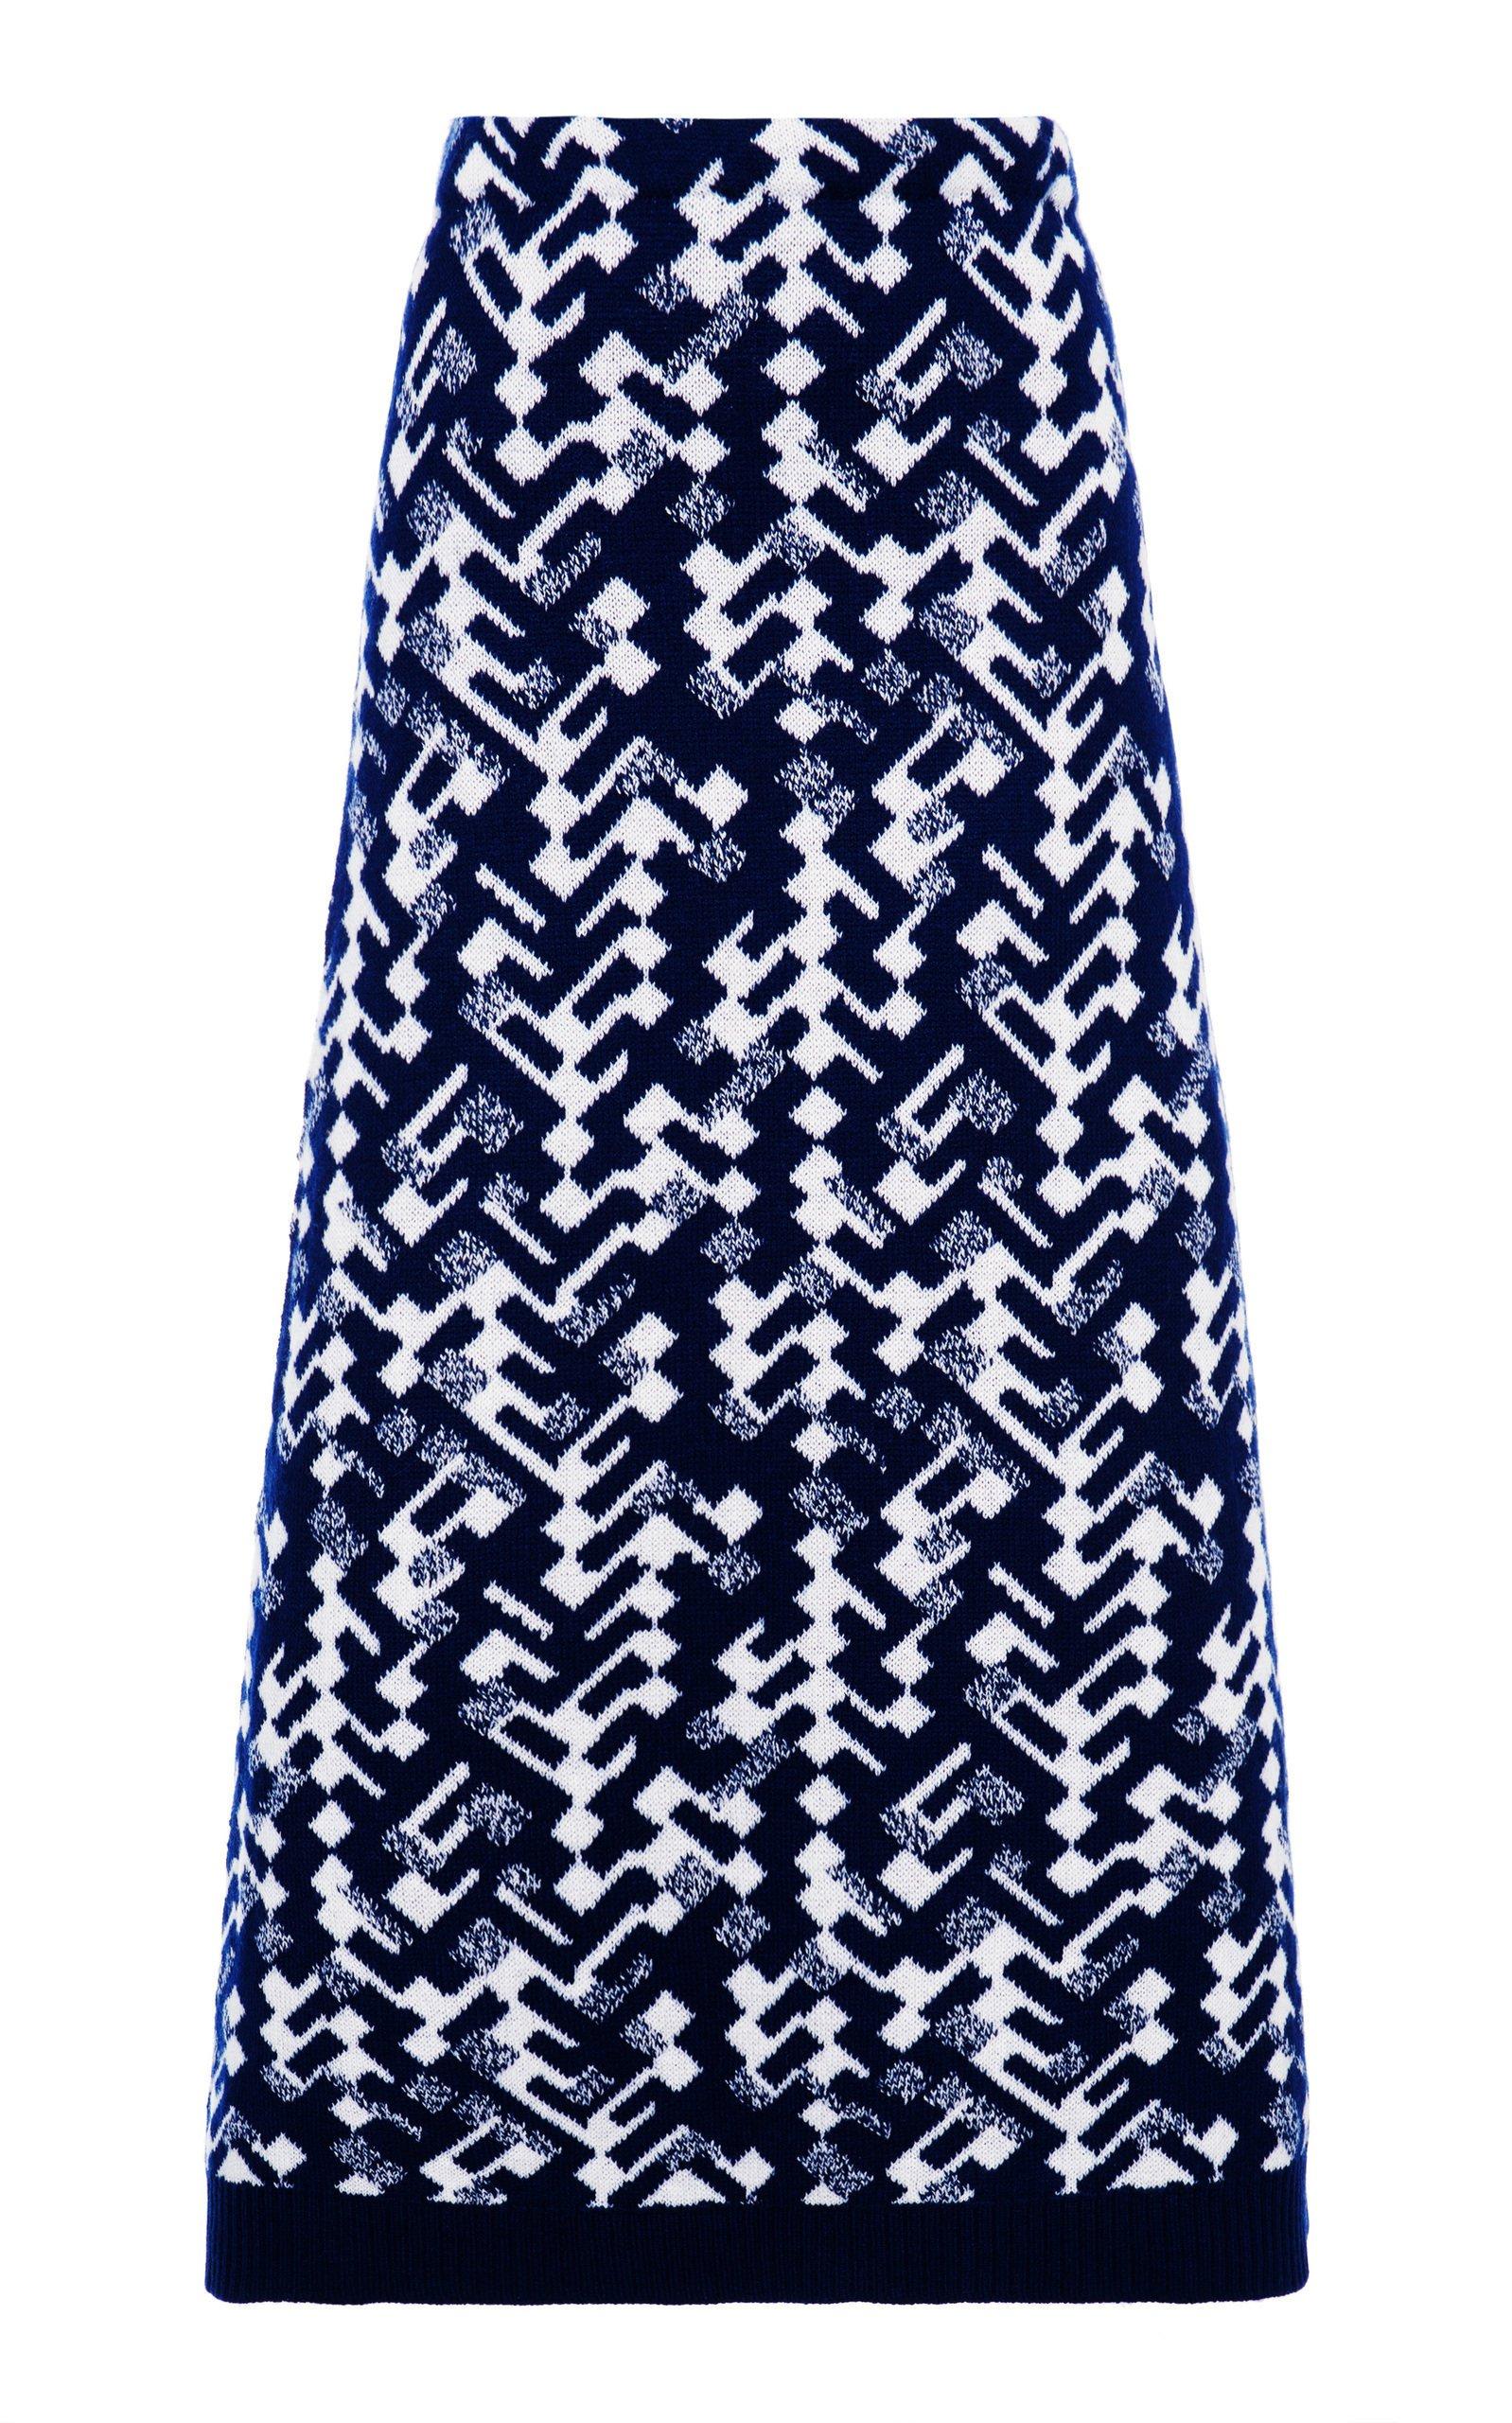 Prada Printed Cashmere Midi Skirt Size: 48